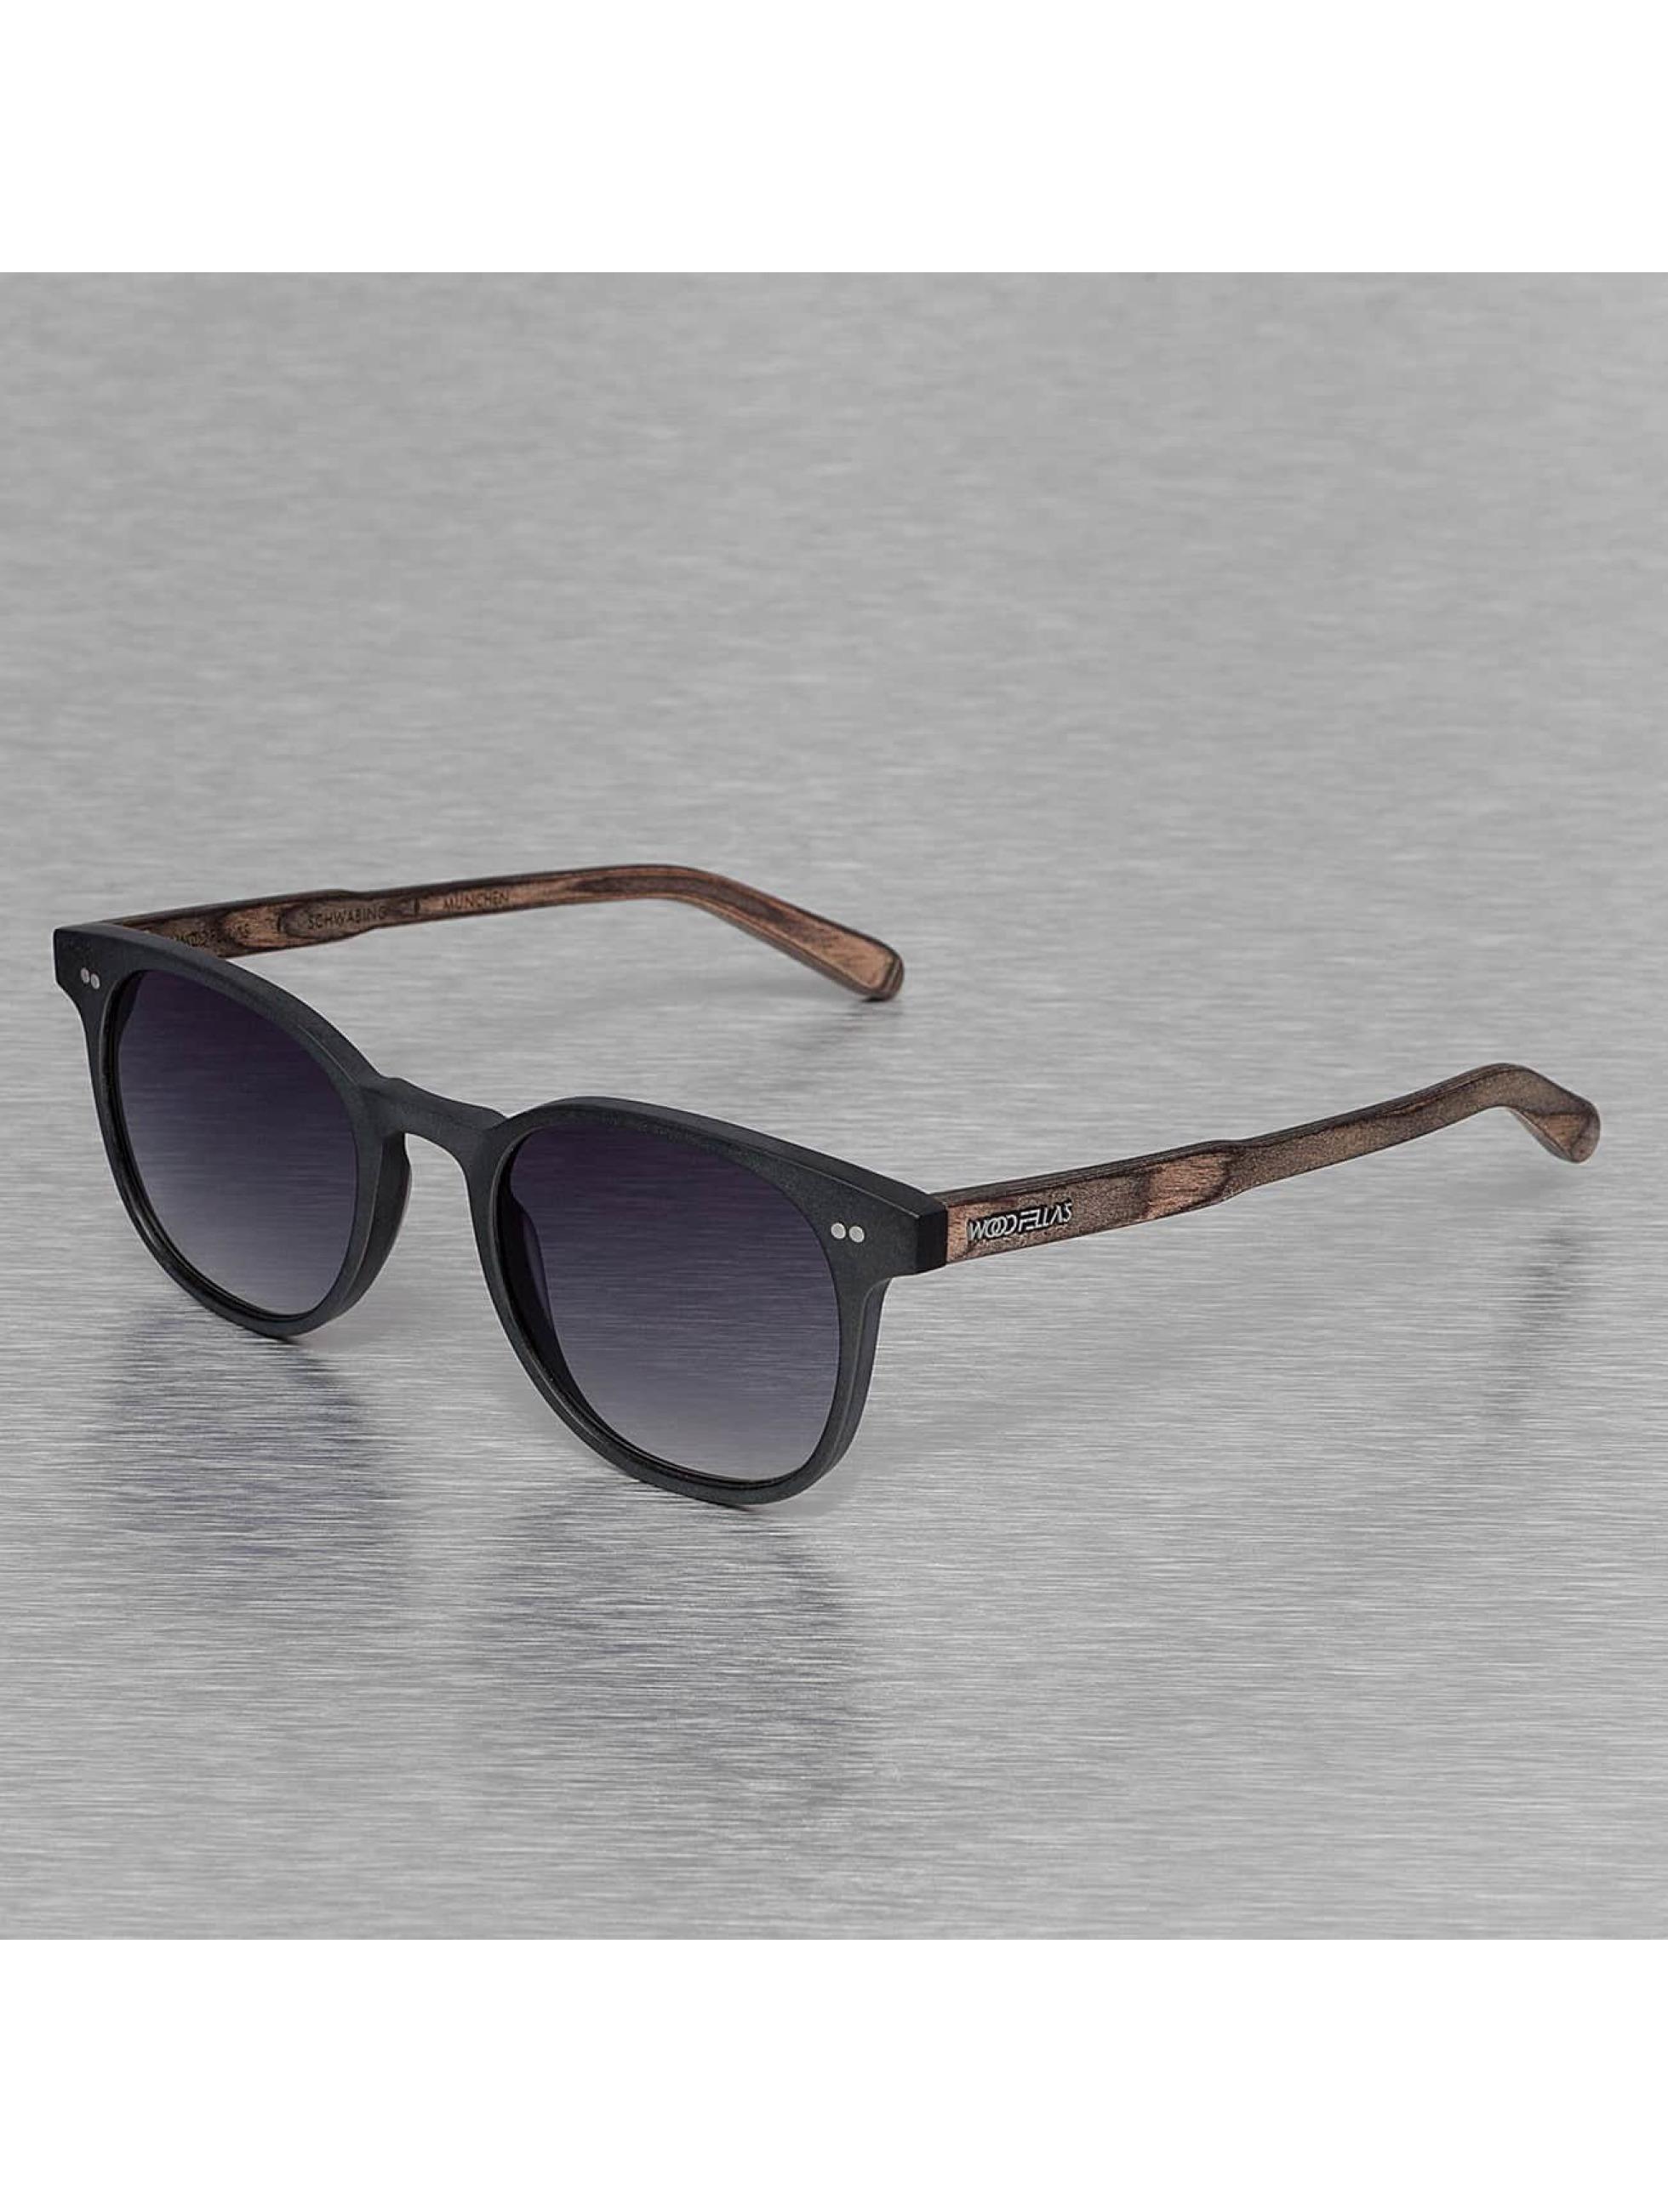 Wood Fellas Eyewear Sunglasses Eyewear Schwabing Polarized Mirror black